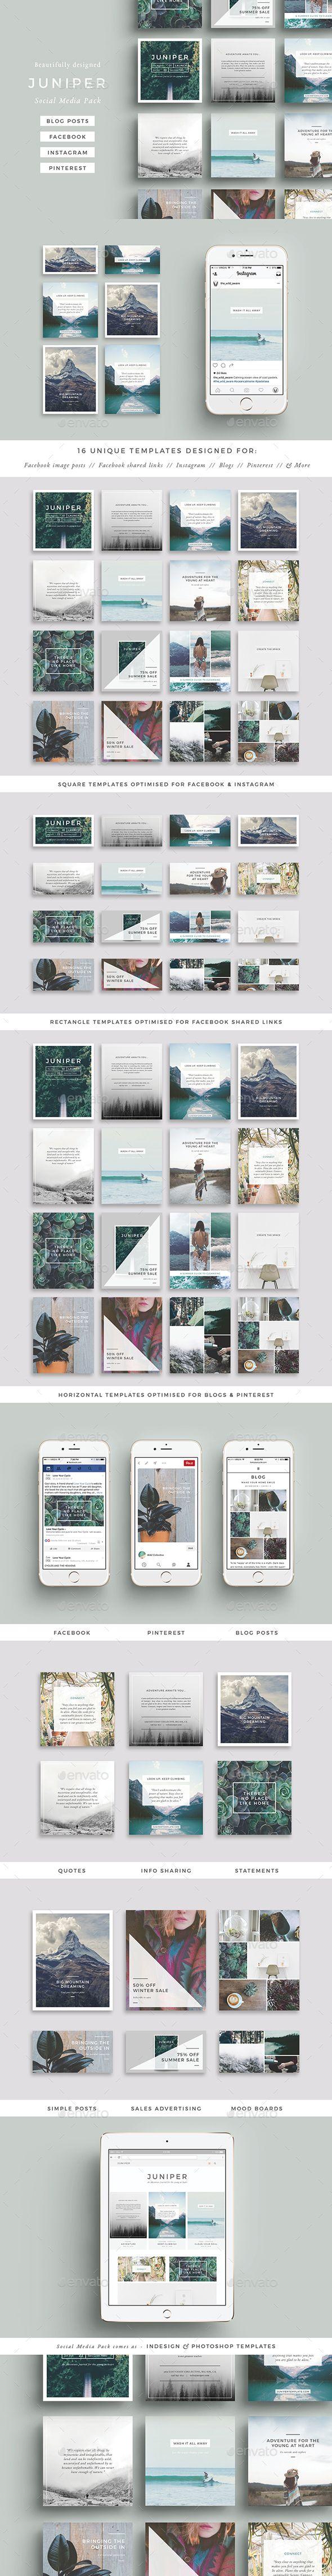 Juniper Social Media Pack  — PSD Template #best social media #Pinterest • Download ➝ https://graphicriver.net/item/juniper-social-media-pack/18468890?ref=pxcr